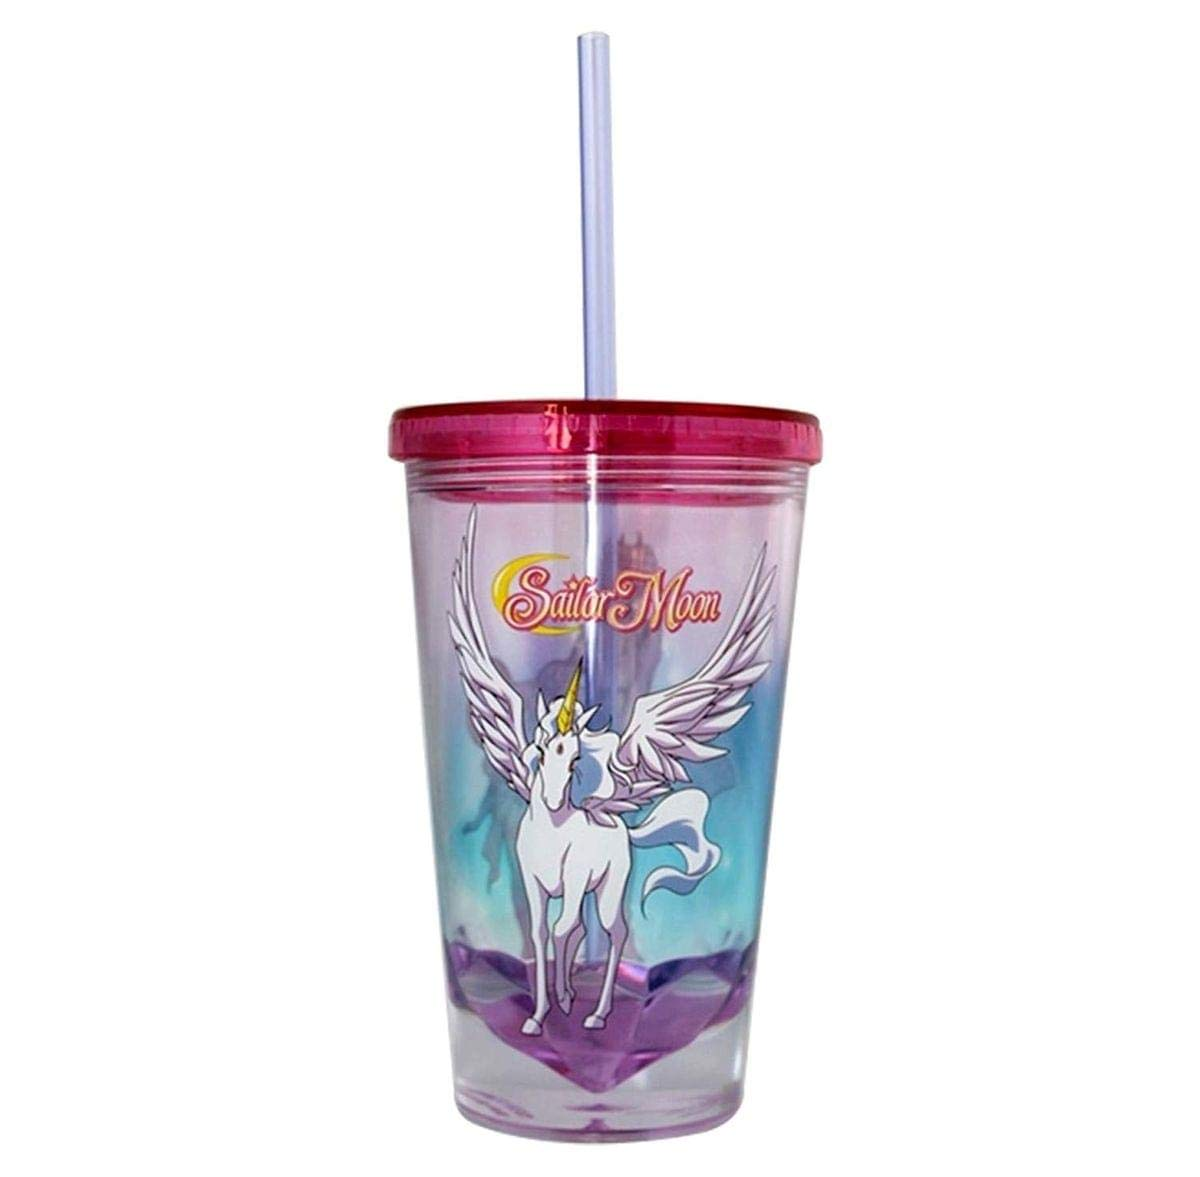 Sailor Moon Pegasus Diamond Bottom 16oz Carnival Cup w/ Straw  Lid